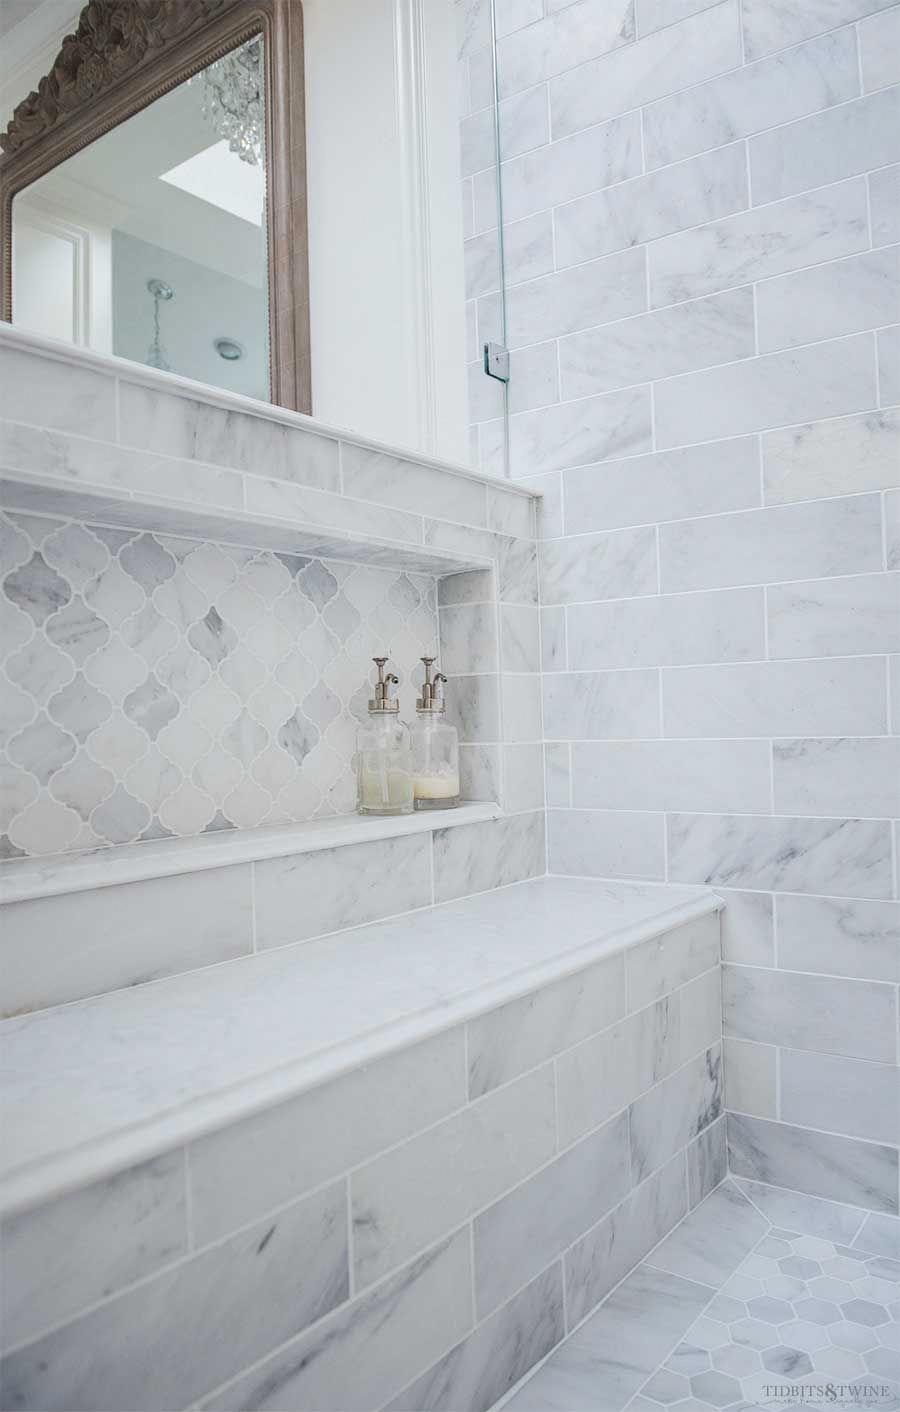 Oversized Shower Niche With Arabesque Carrara Marble In French Elegant Master Bathroom In 2020 Zen Bathroom Decor Master Bathroom Decor Shower Niche